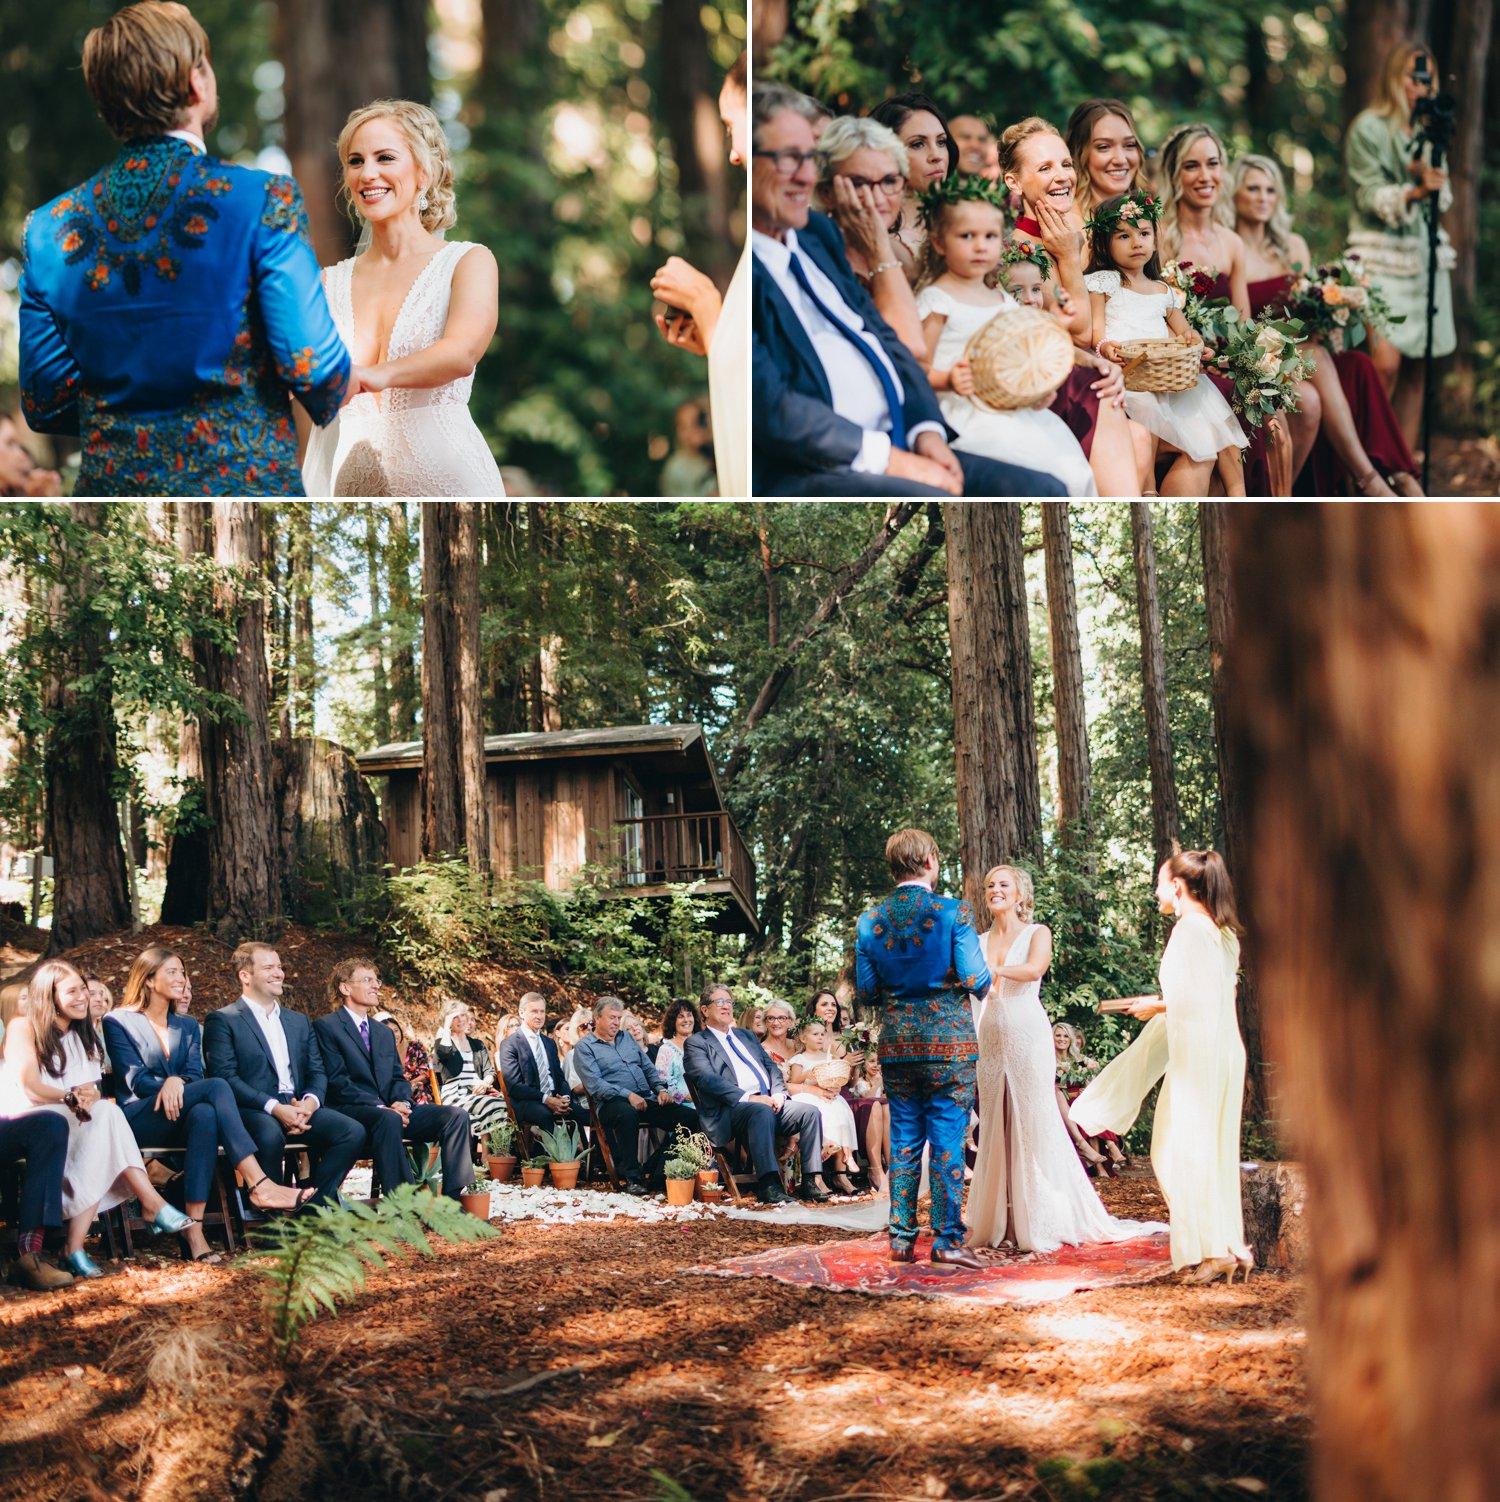 sequoia retreat wedding photography 25.jpg